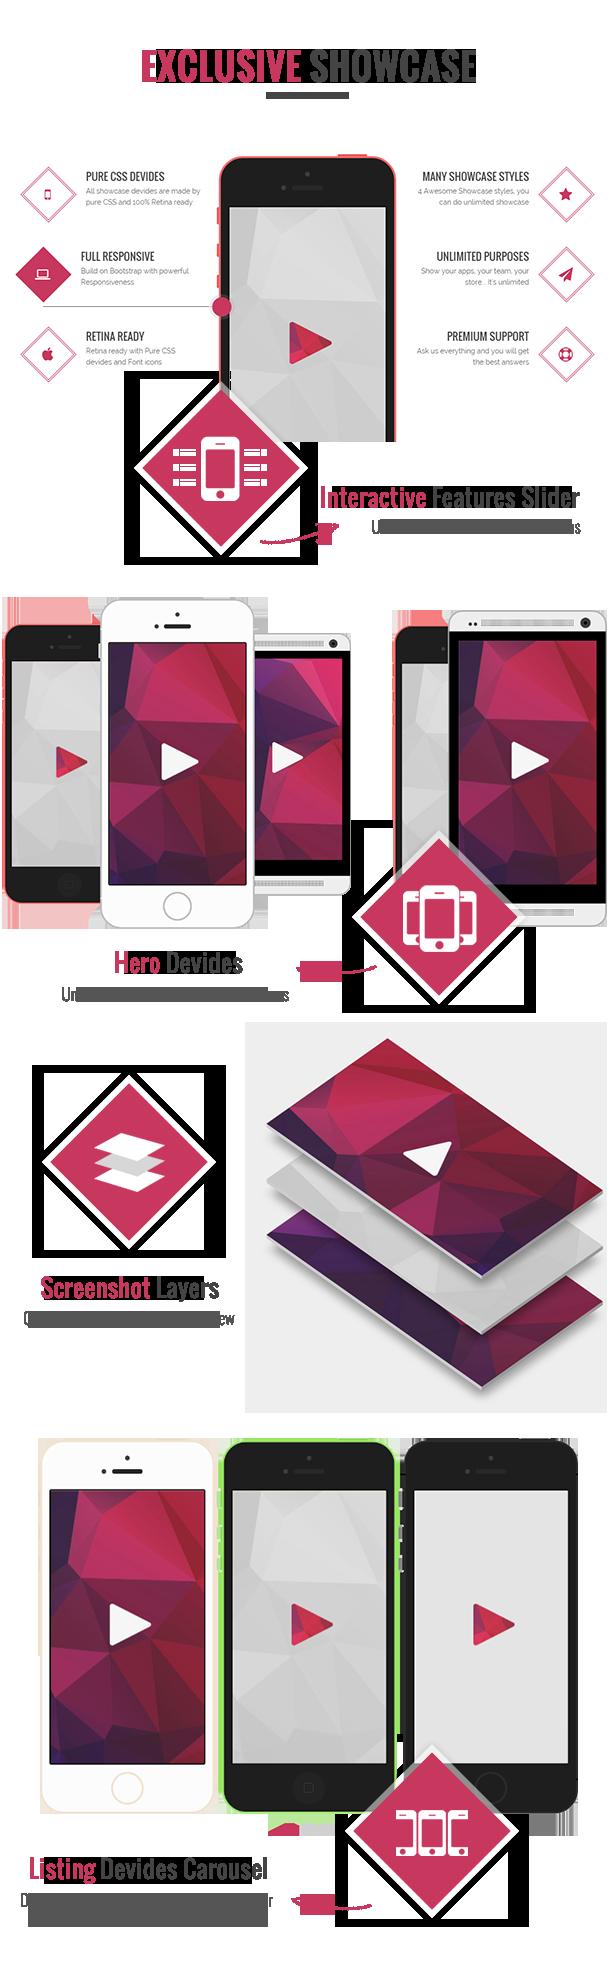 showcase devide - Applay - WordPress App Showcase & App Store Theme